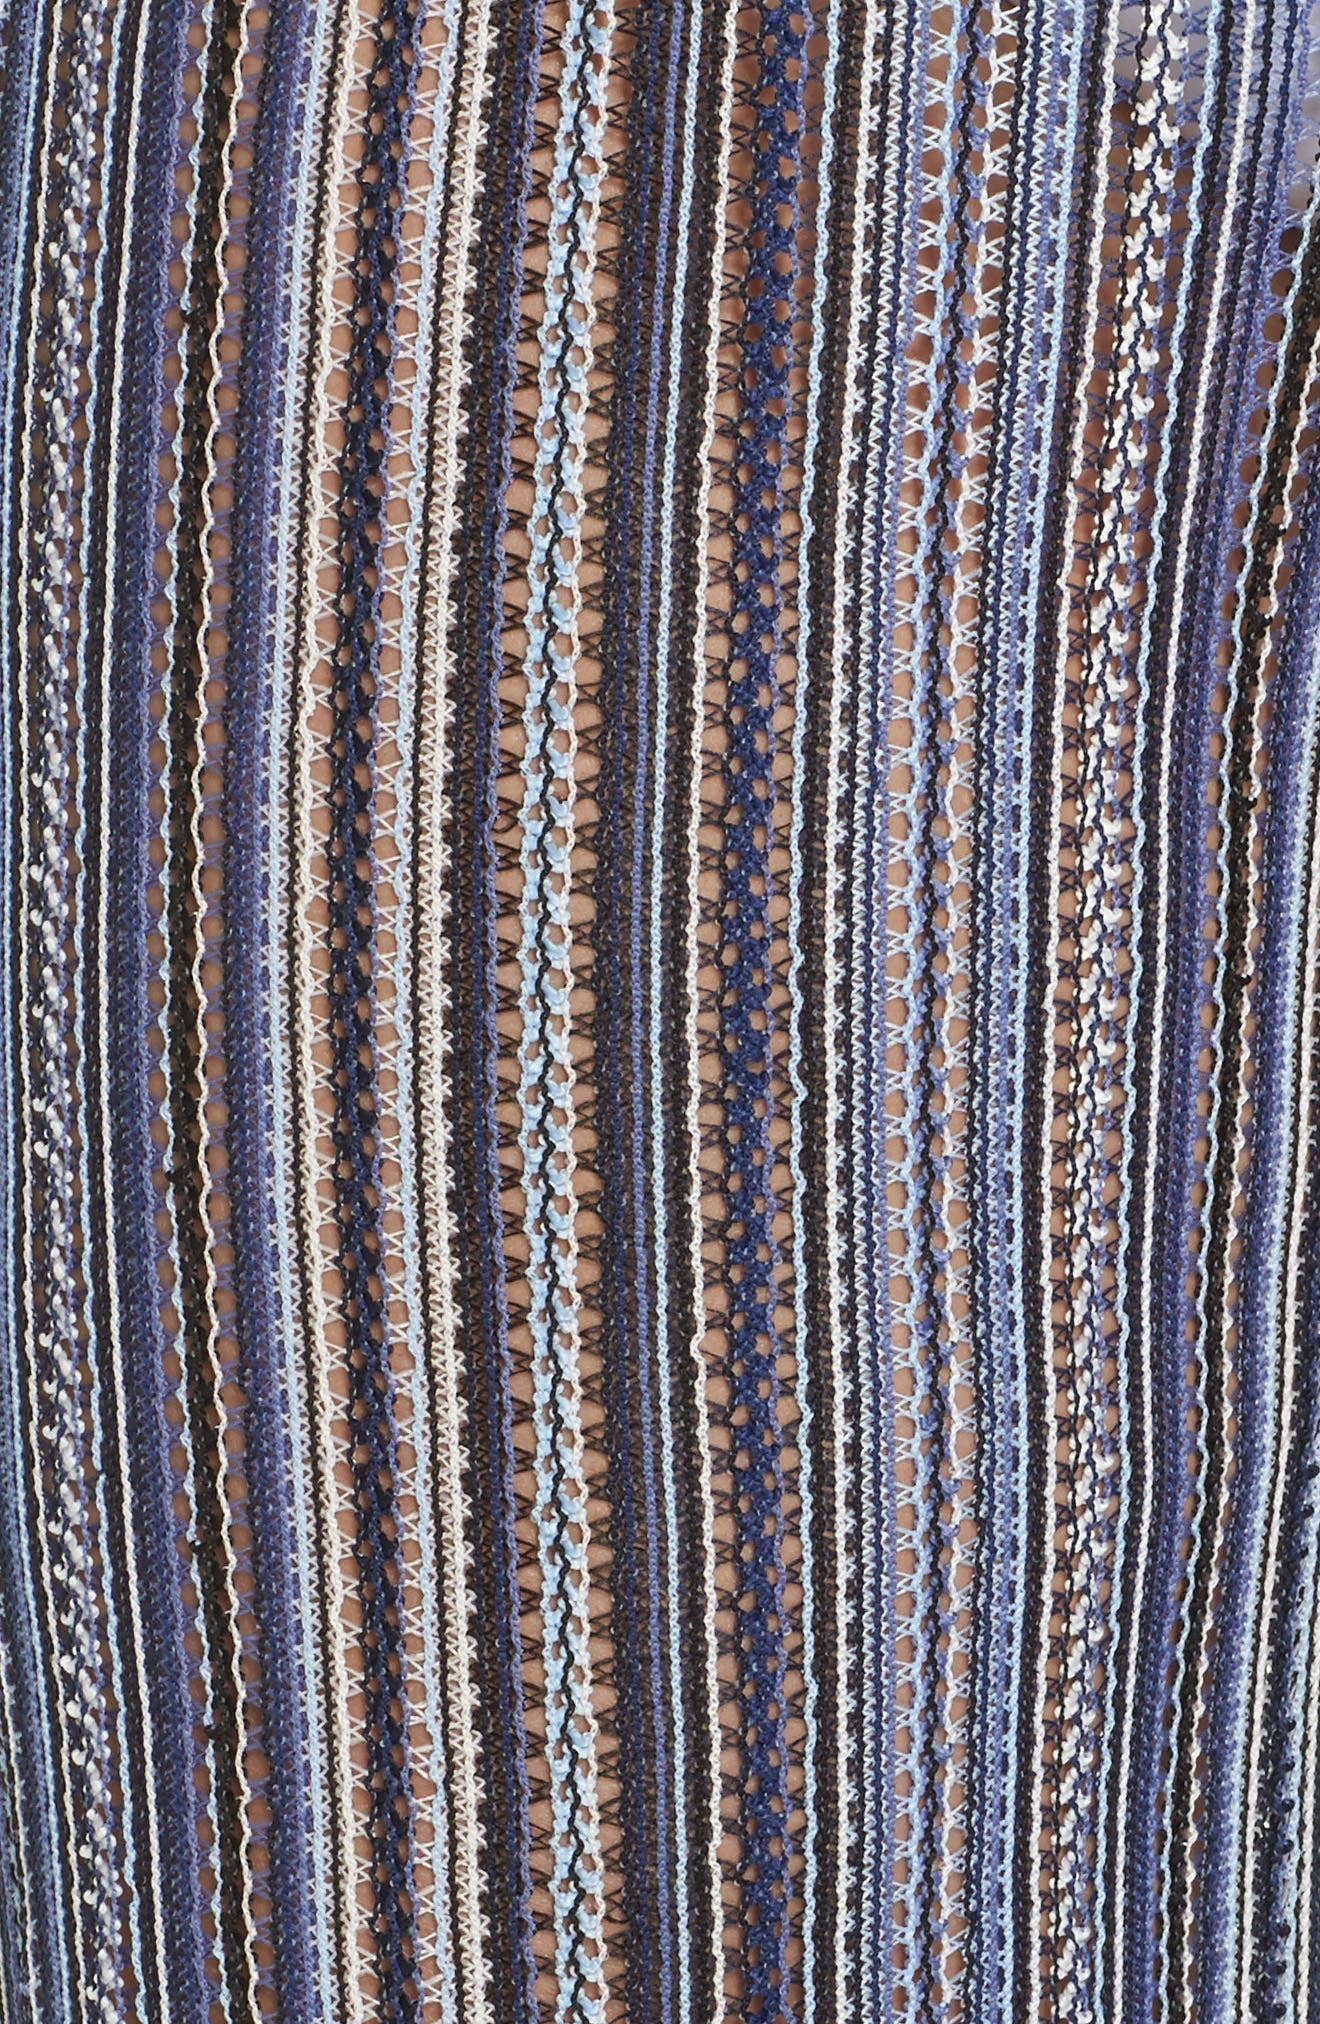 Pierside Cover-Up Flyaway Pants,                             Alternate thumbnail 5, color,